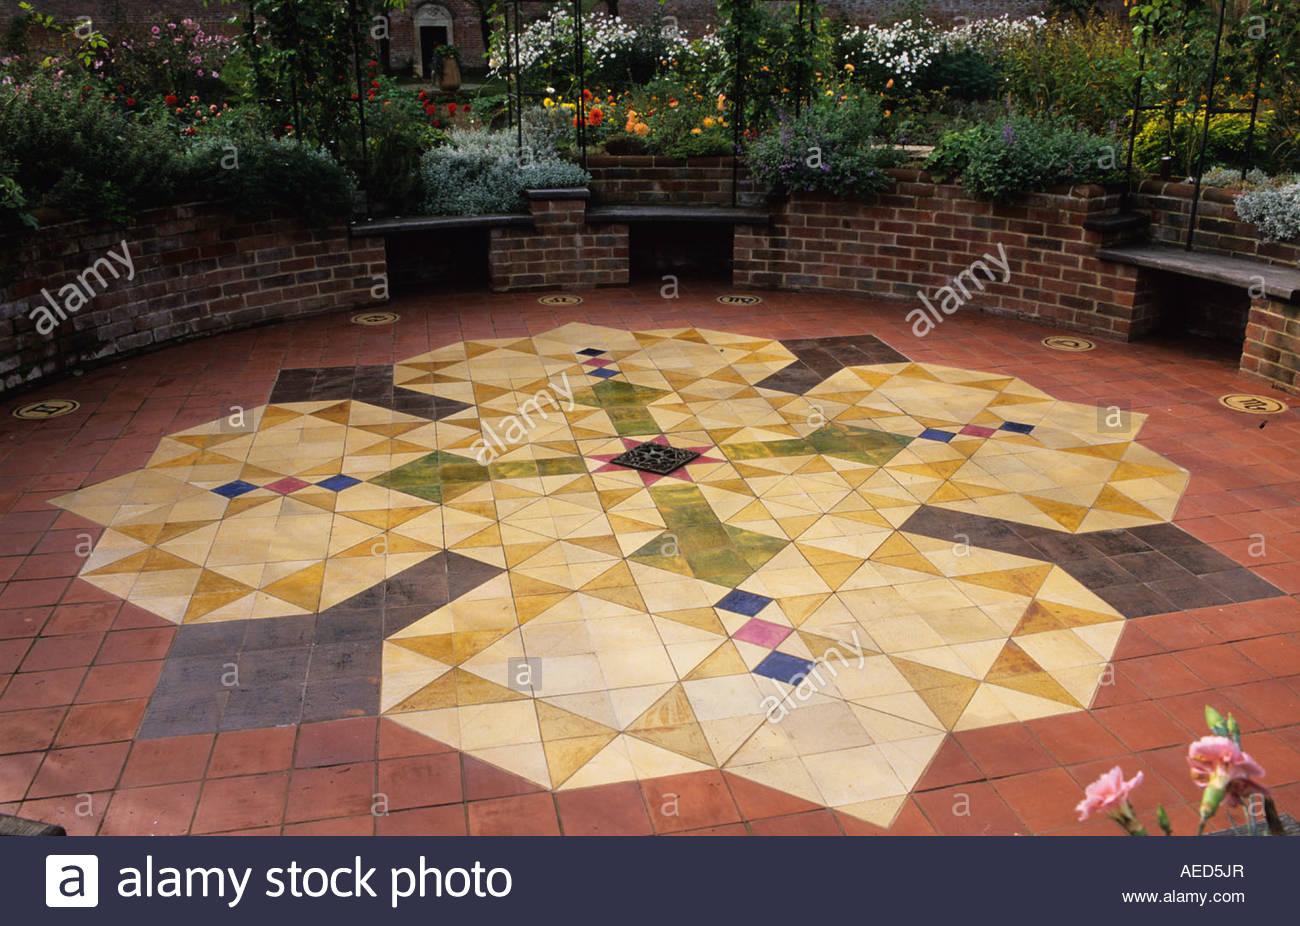 Fußboden John ~ Broxmore hampshire design pamela woods heiligen garten innenhof